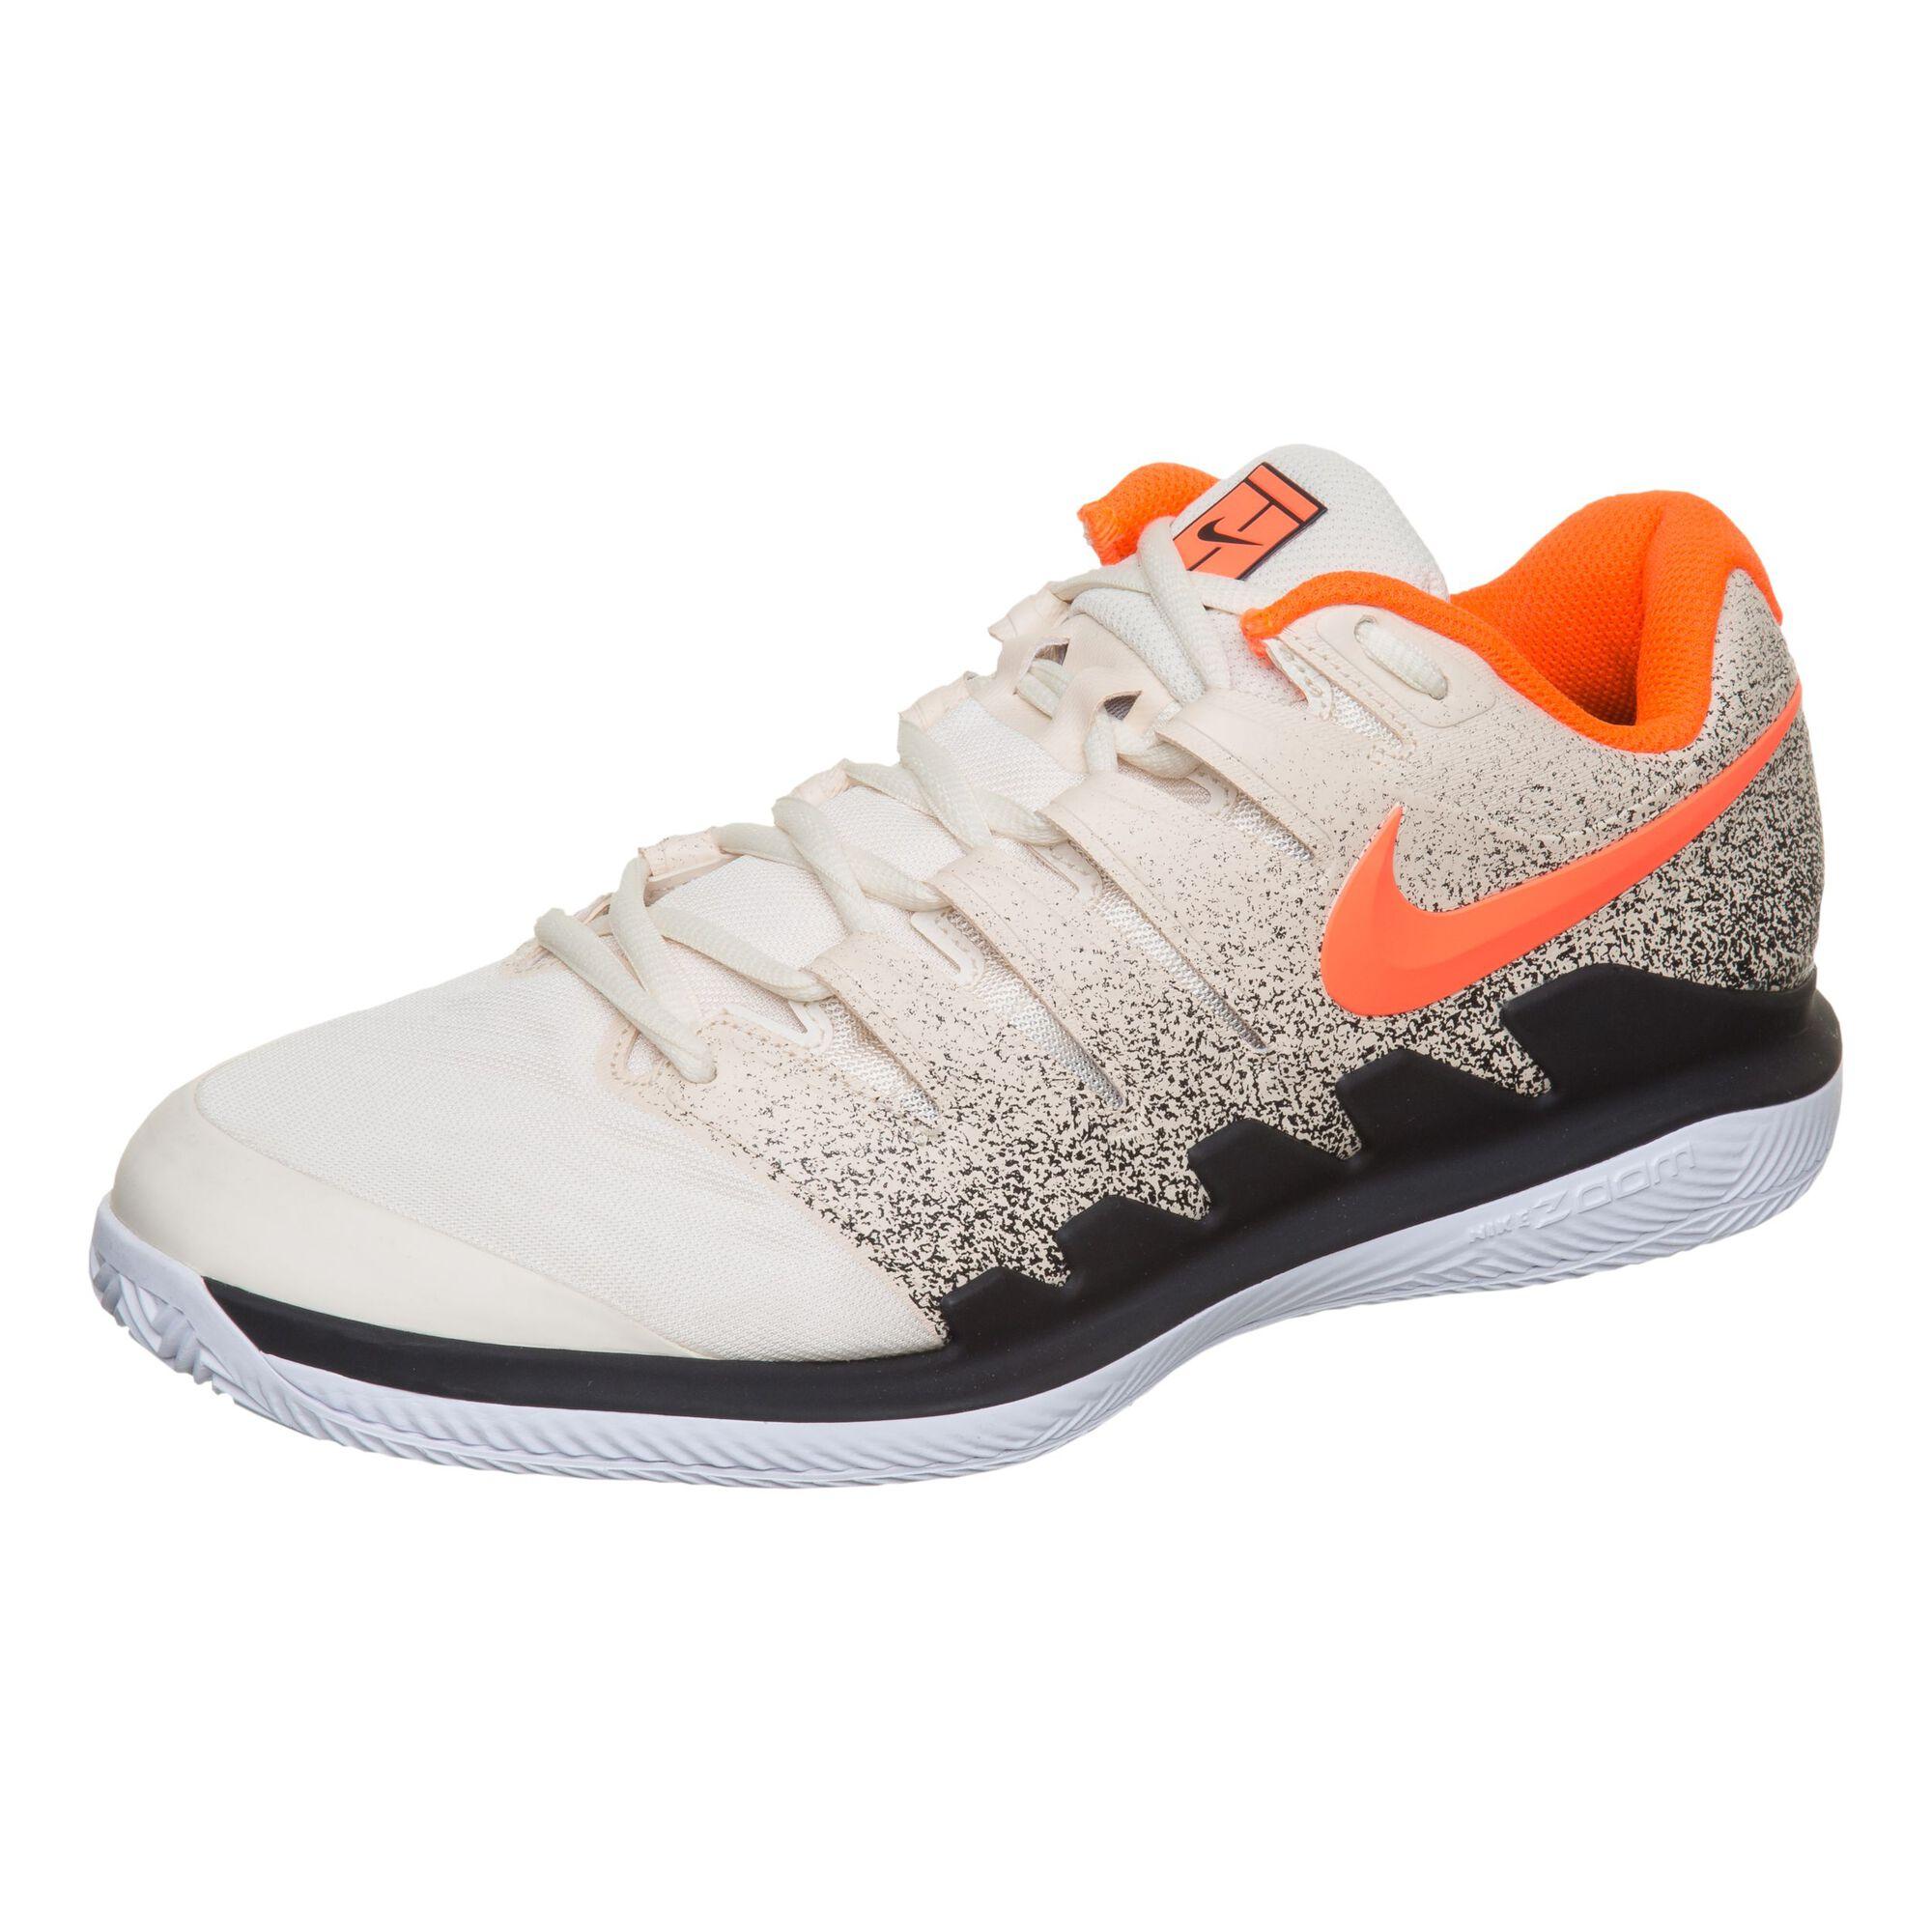 8db92d73236 Nike · Nike · Nike · Nike · Nike · Nike · Nike · Nike · Nike · Nike · Nike. Air  Zoom Vapor X Clay Men ...